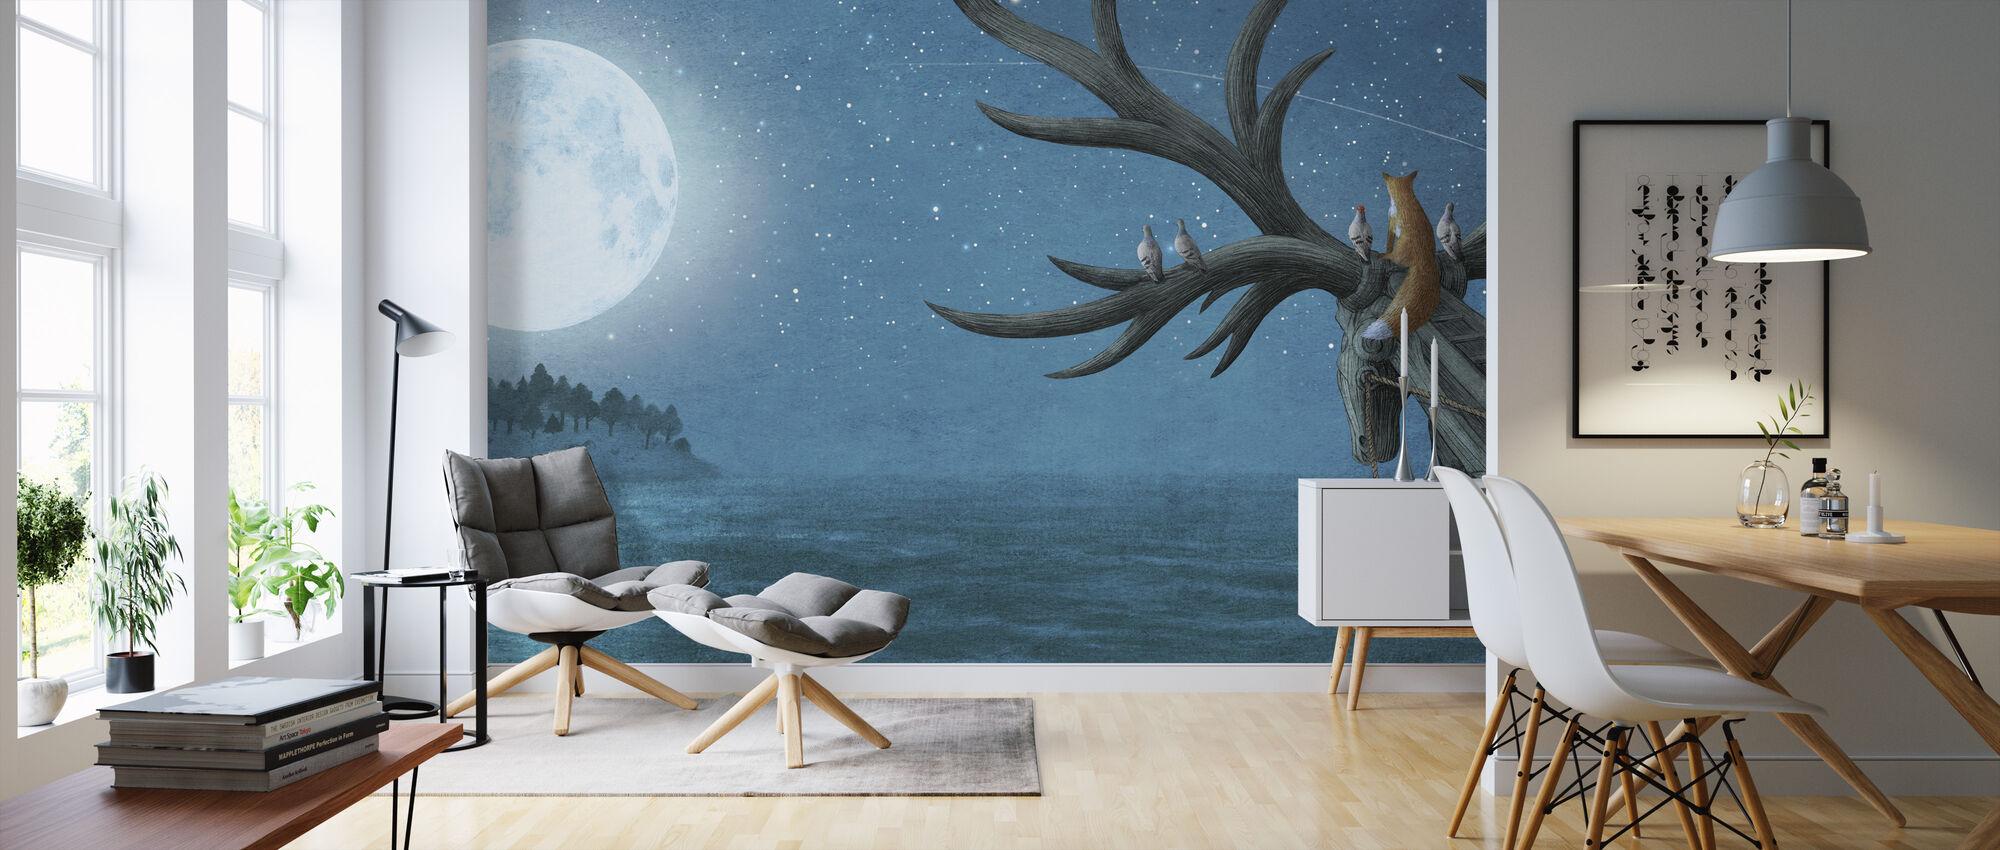 Antlered Ship Island Sighting - Wallpaper - Living Room